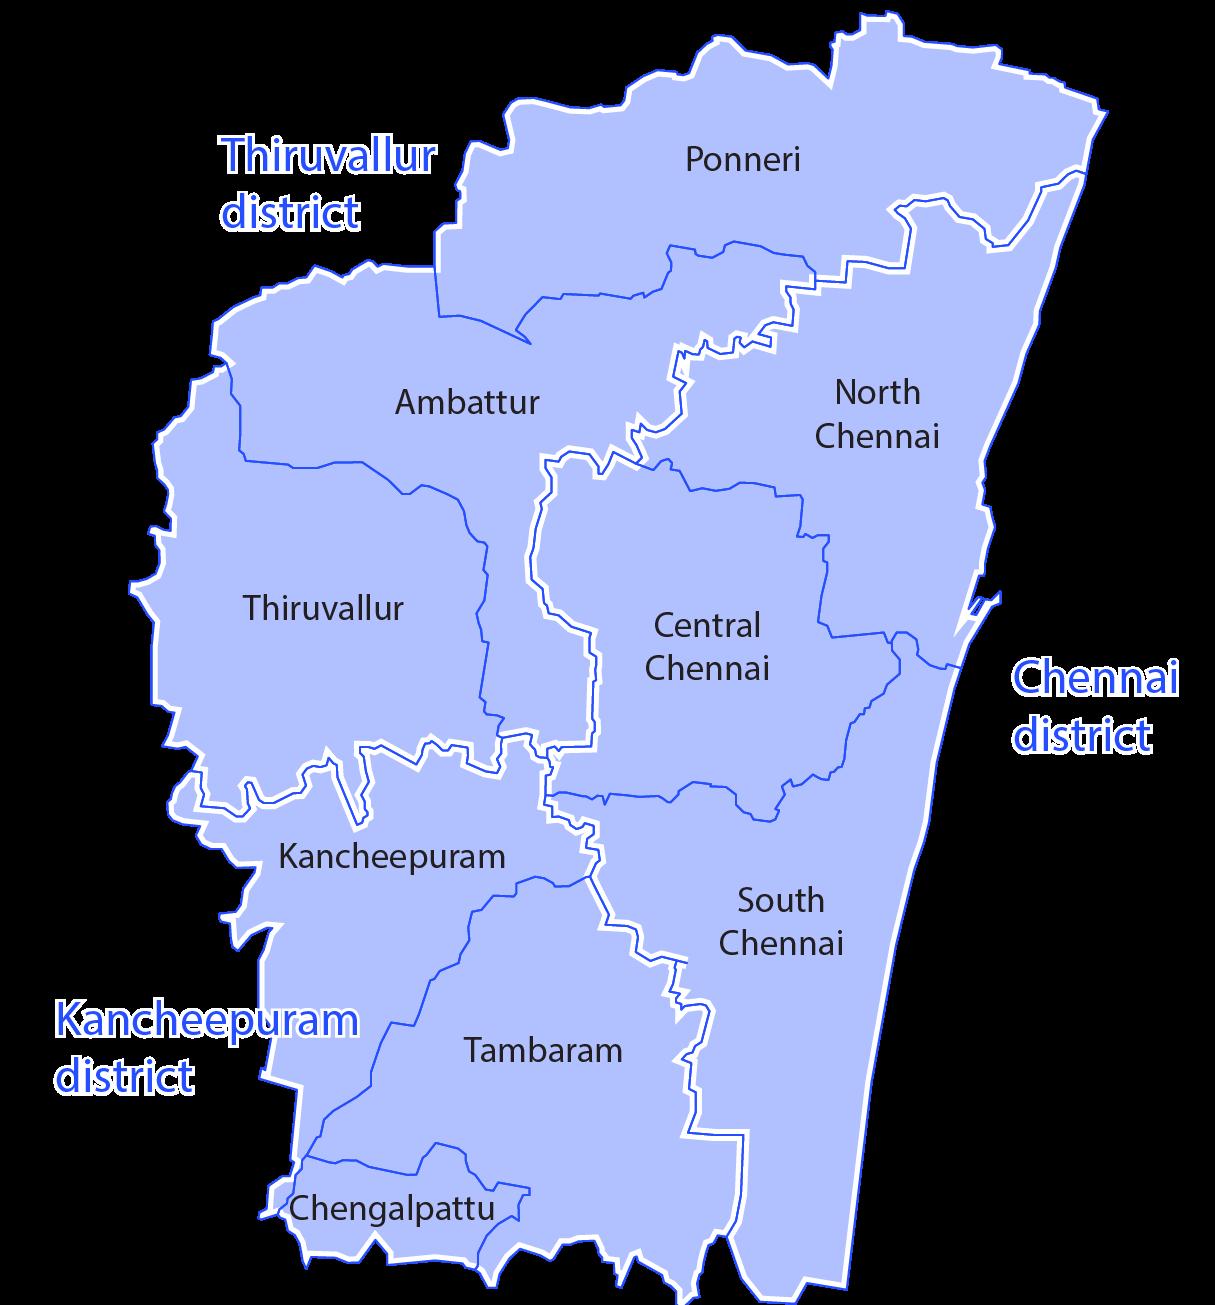 Speculation on Property in Chennai: Location Kotturpuram